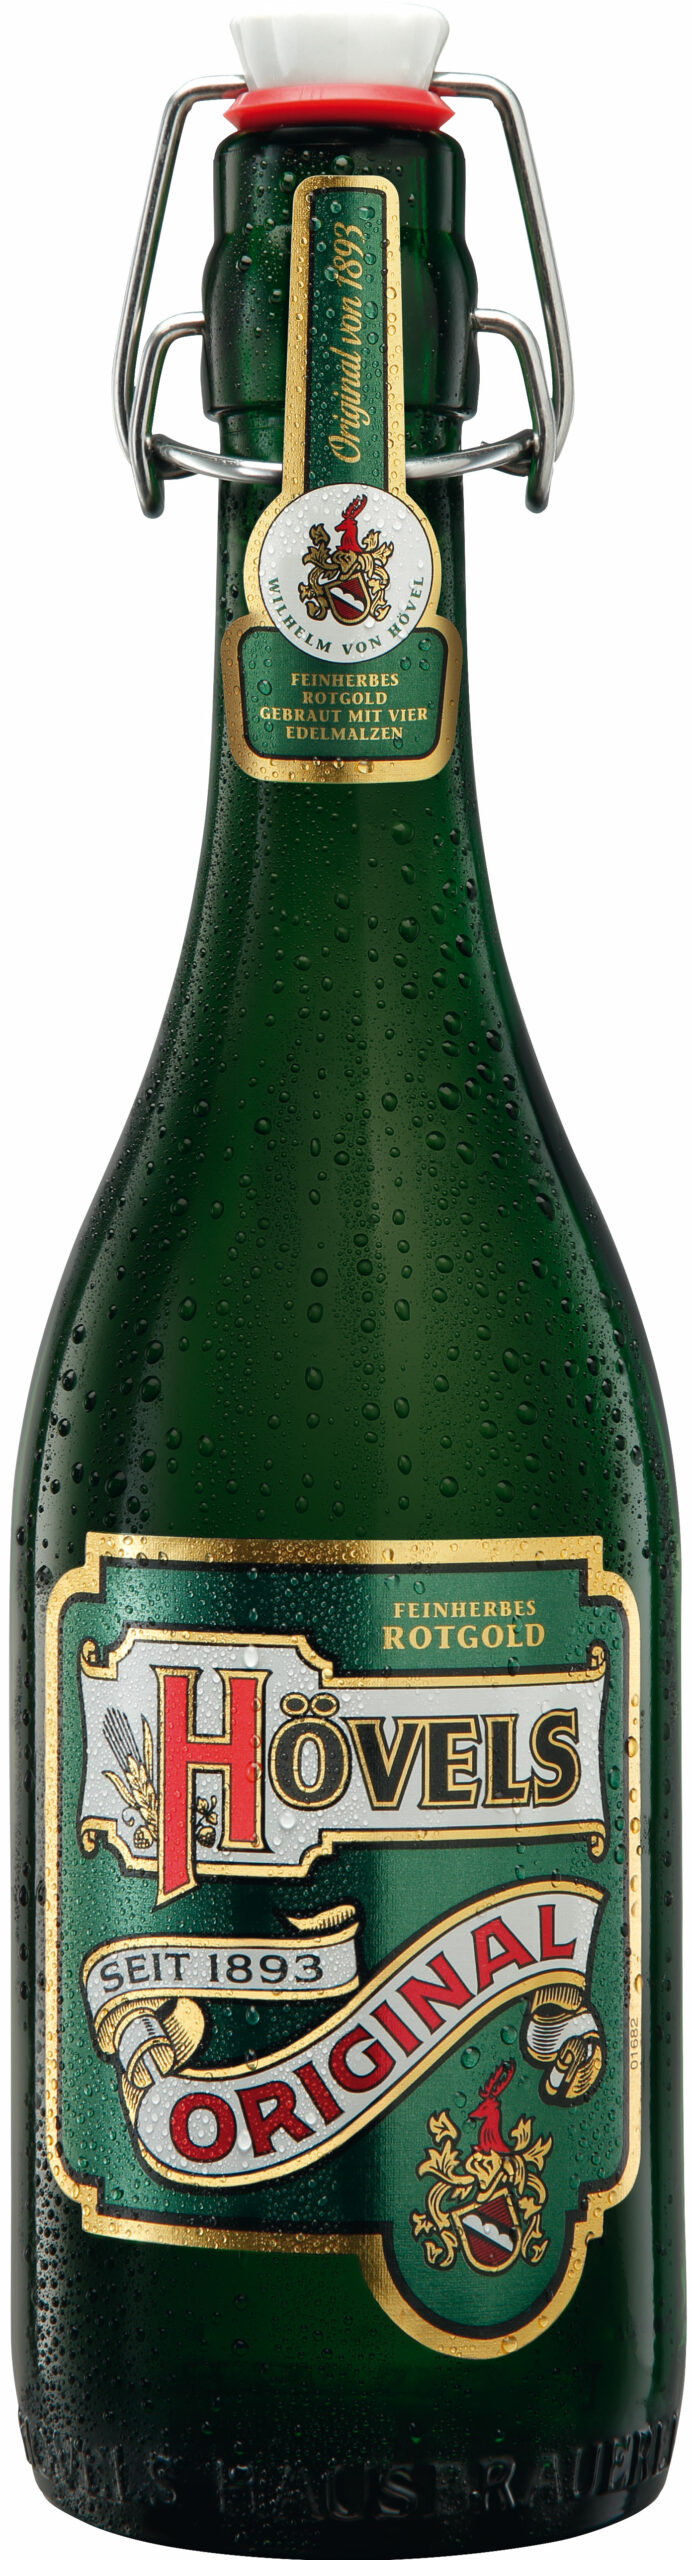 Hövels Original Flasche 0,5 Liter